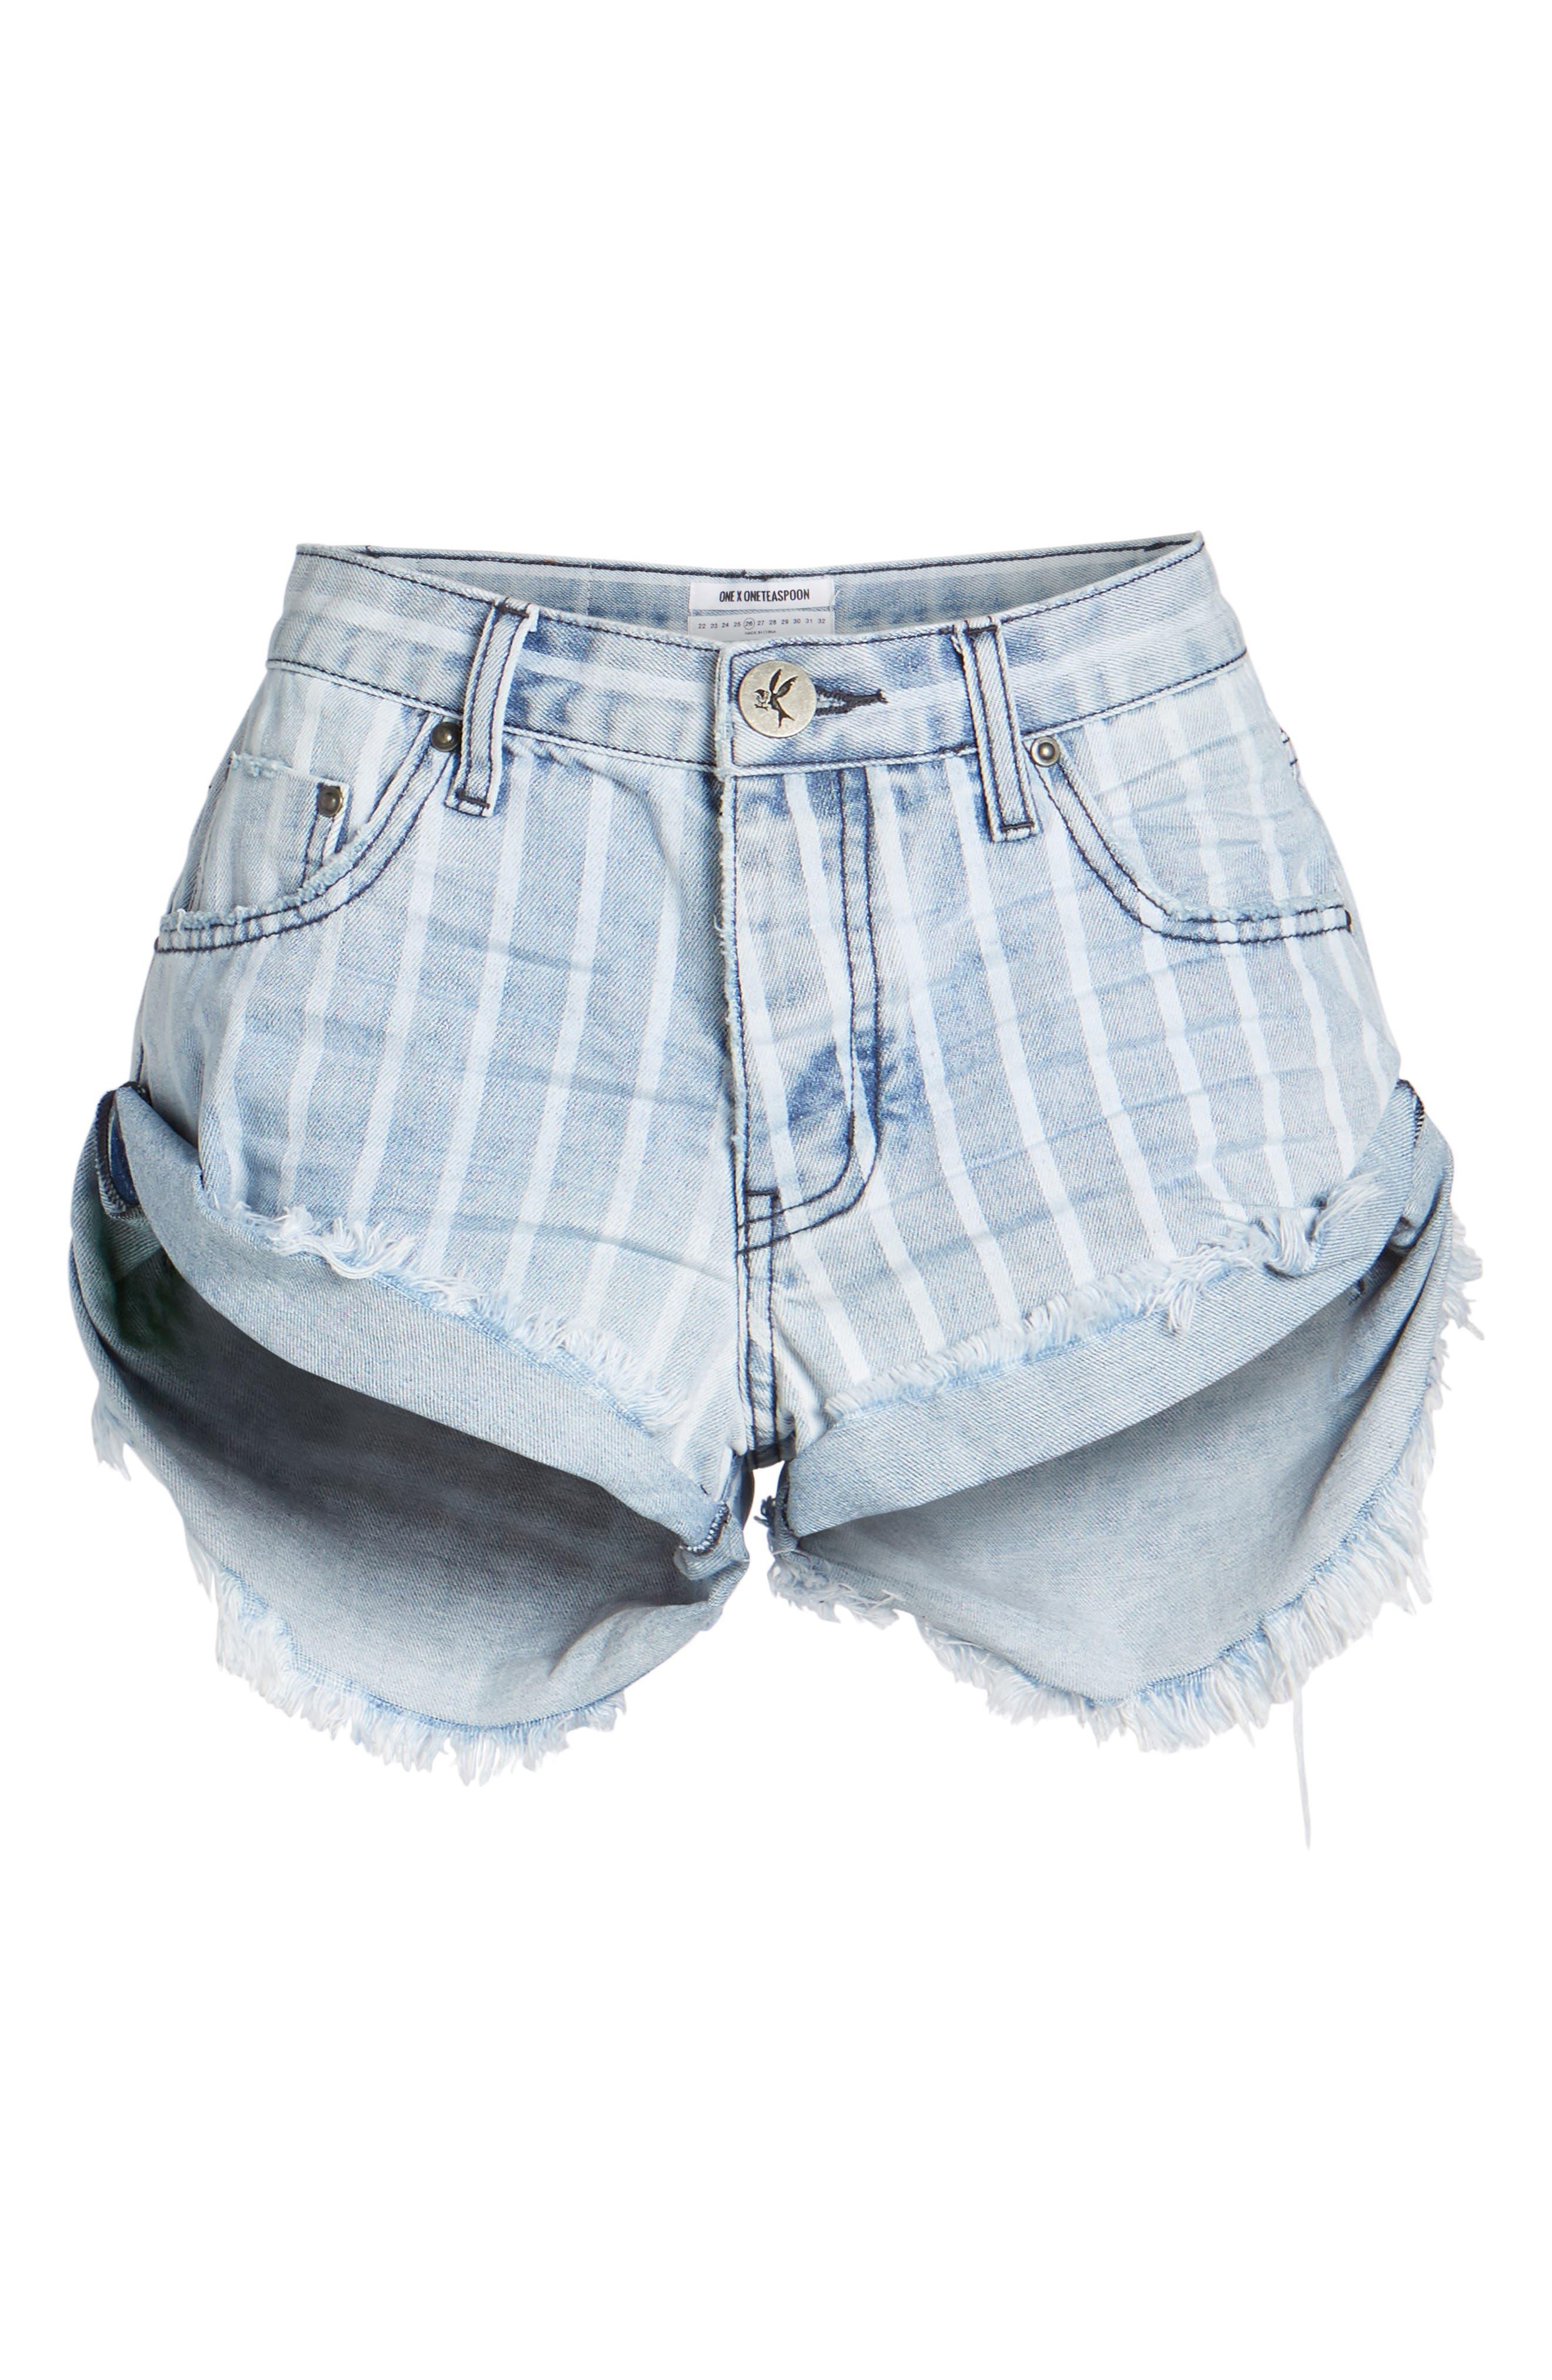 Bandit Stripe Denim Shorts,                             Alternate thumbnail 7, color,                             Rocky